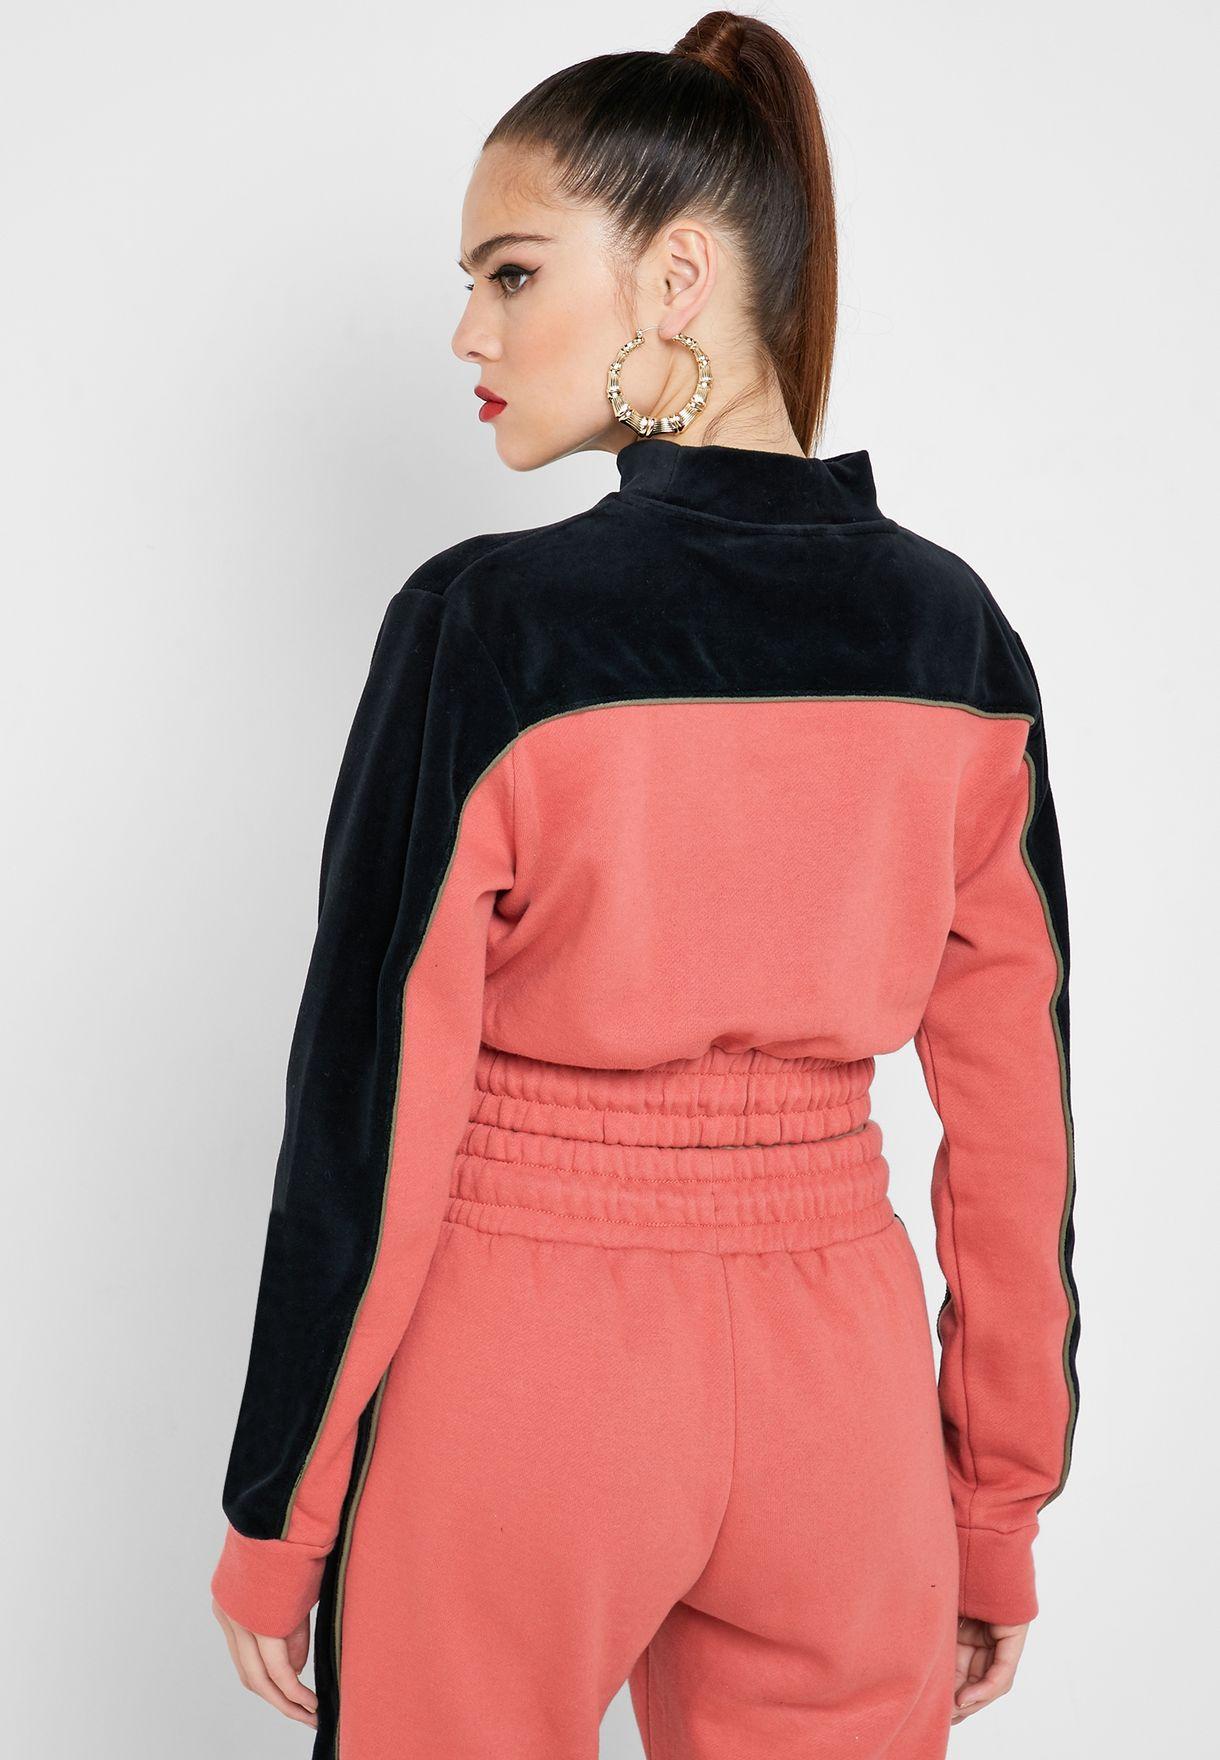 Cadence Velour Sweatshirt